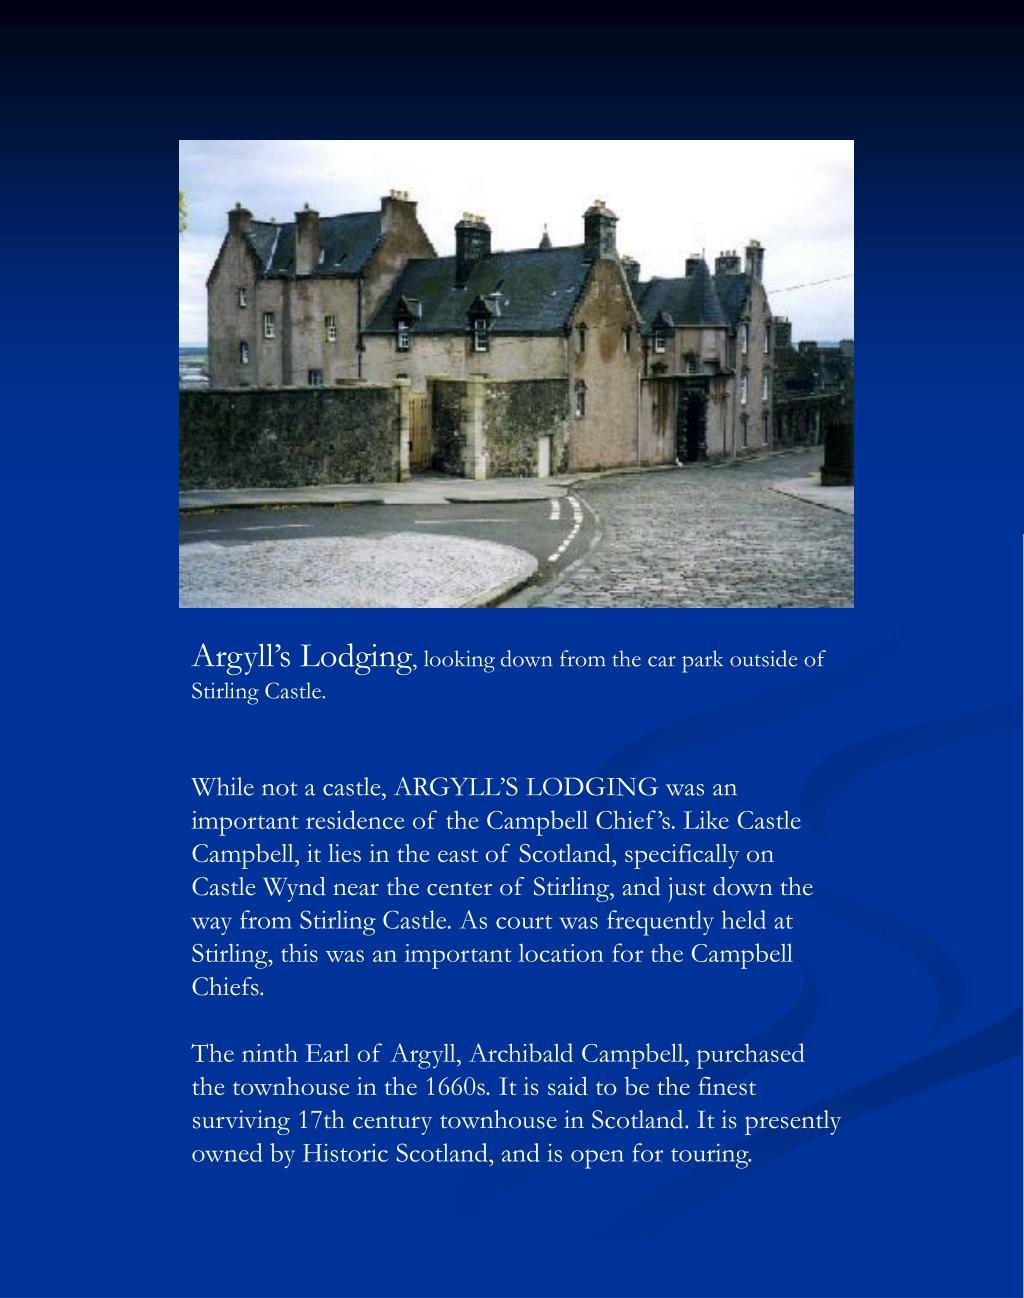 Argyll's Lodging